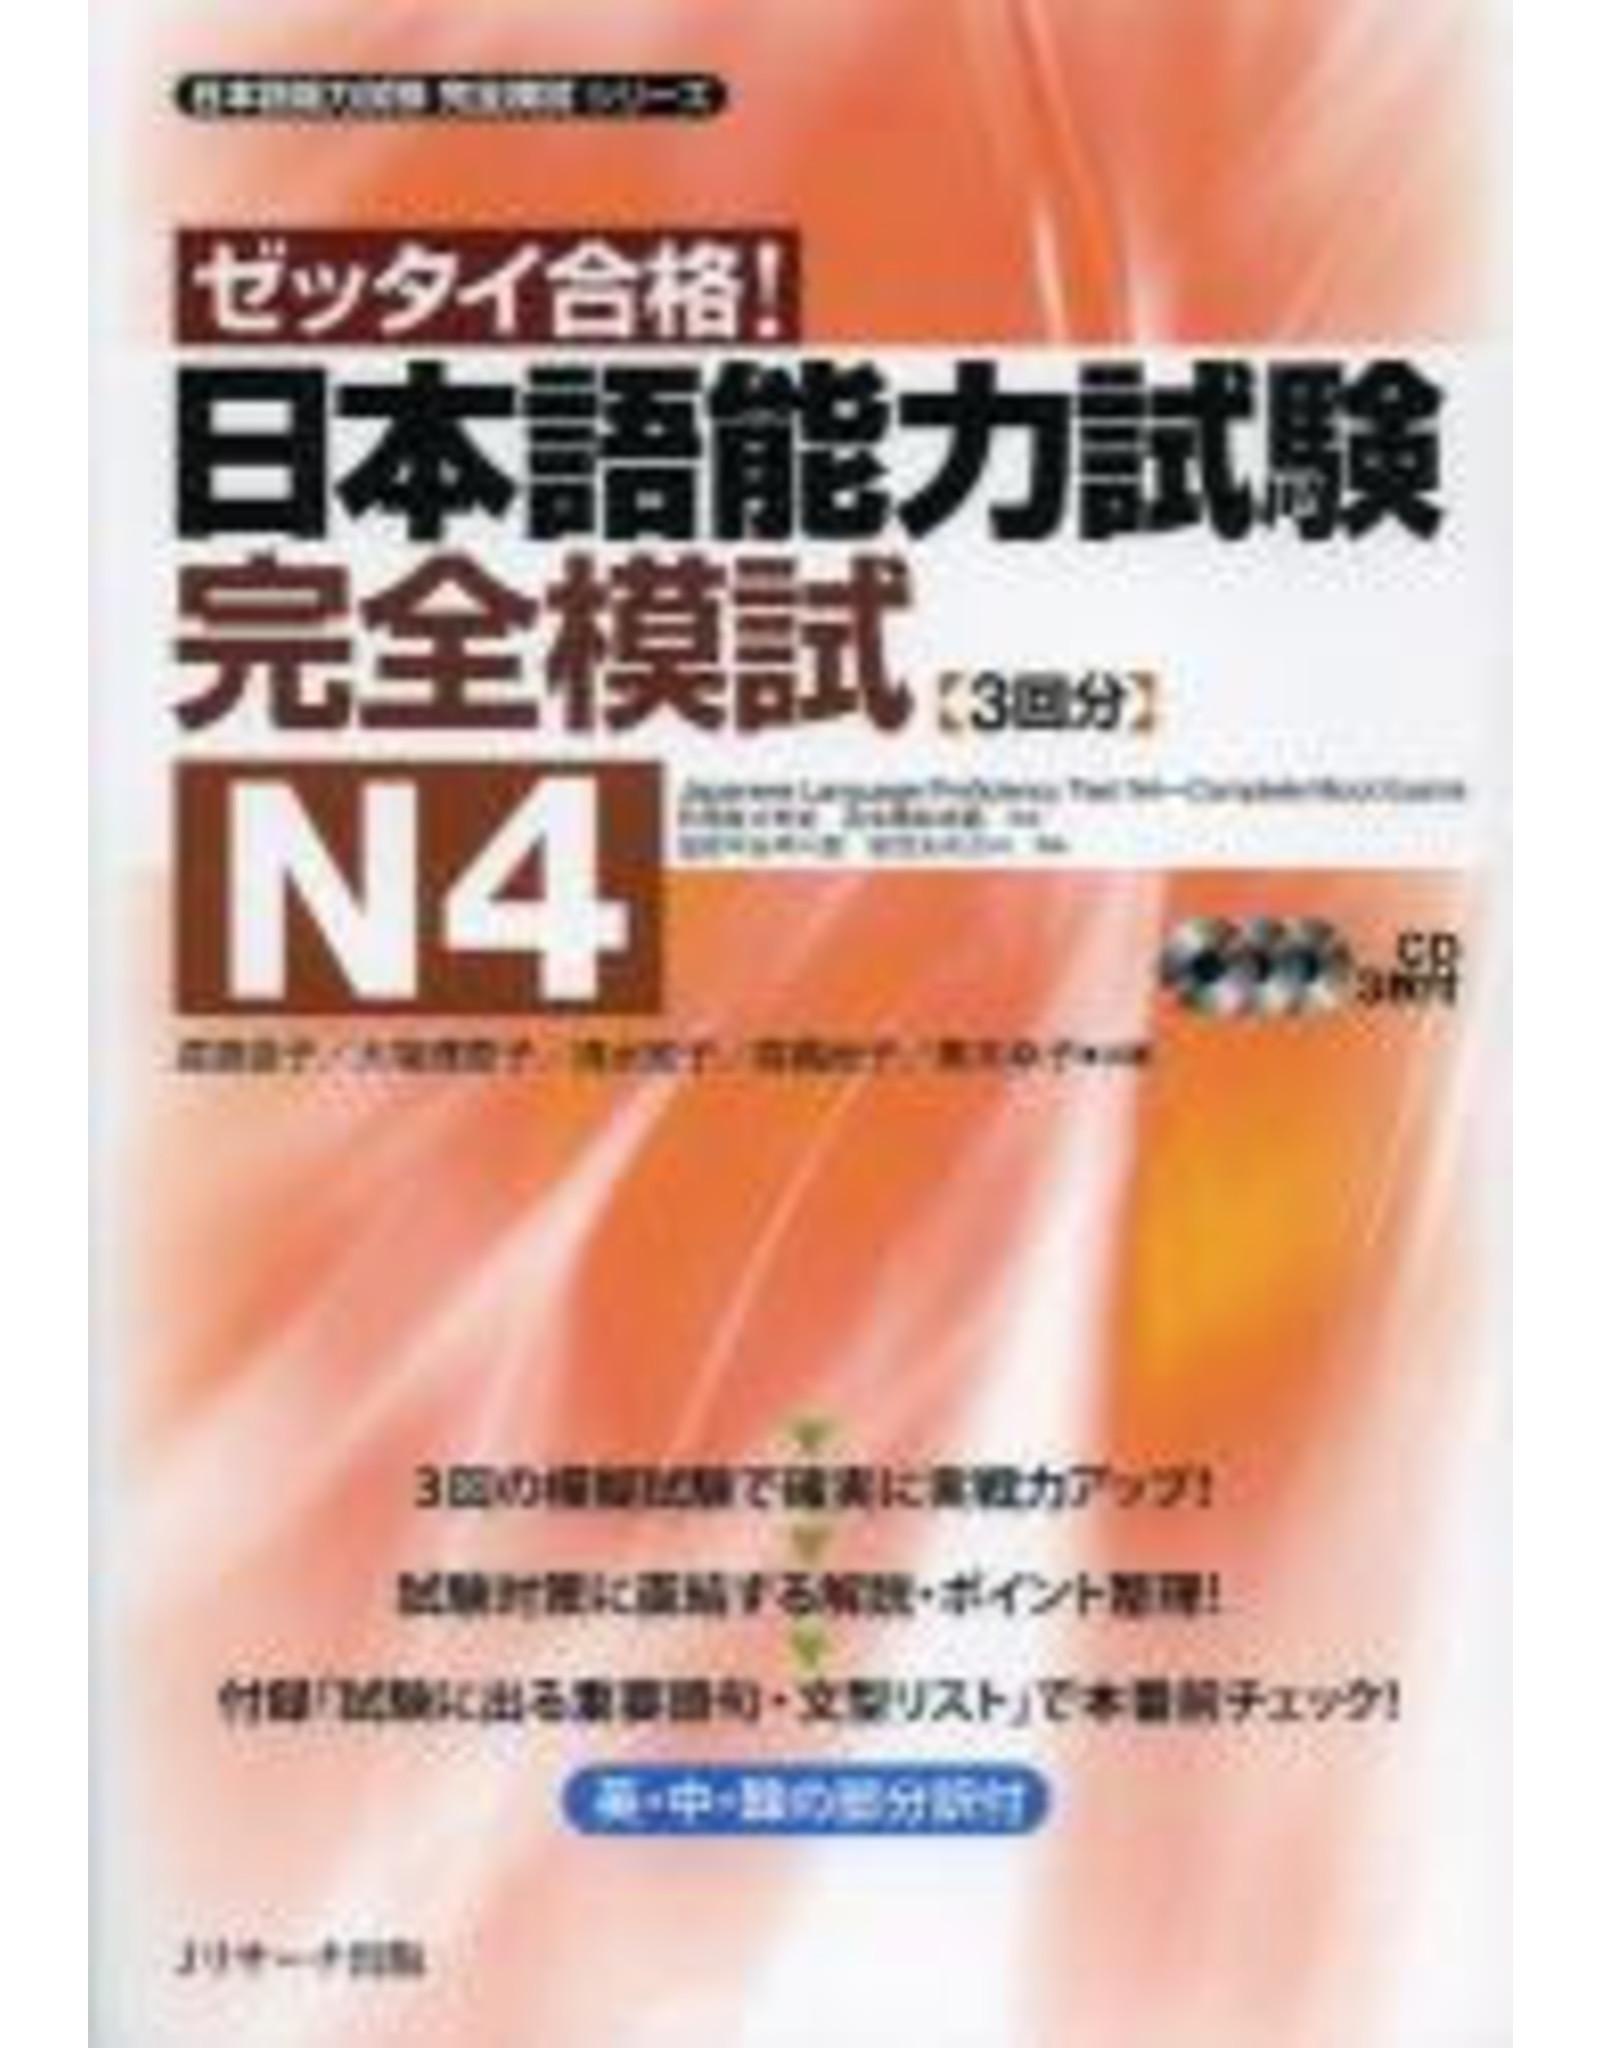 J RESEARCH JLPT KANZEN MOSHI N4 W/CDS : JLPT N4 COMPLETE MOCK EXAMS